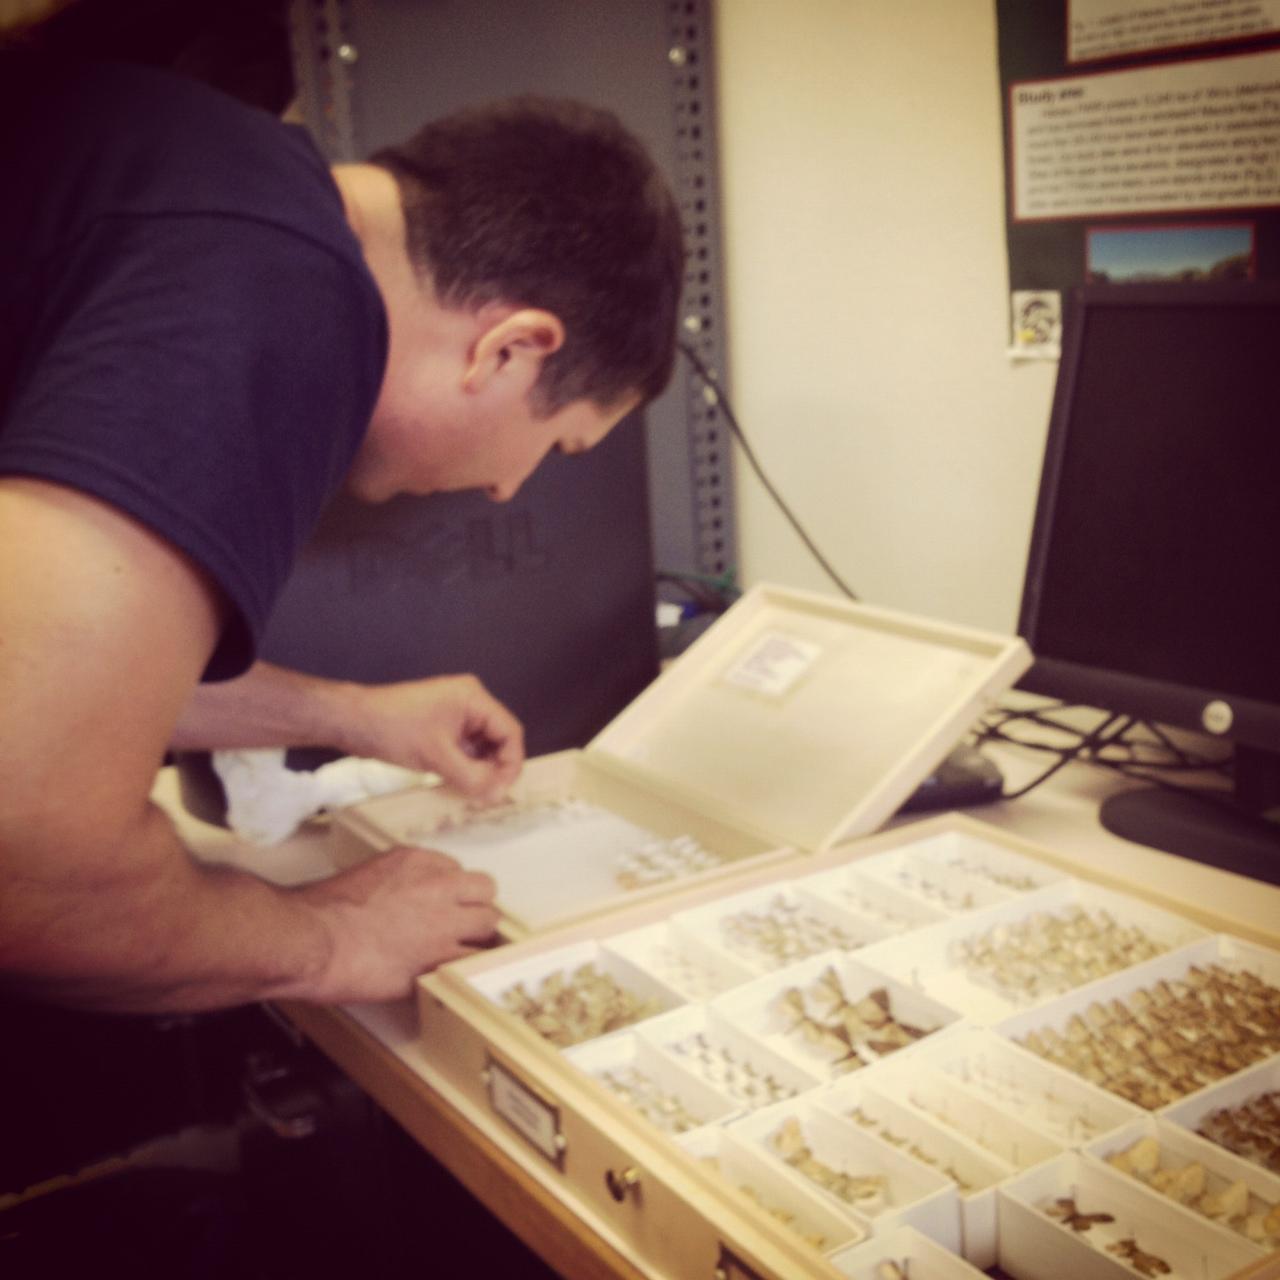 Sorting moth specimens on the Big Island of Hawaii, 2012.